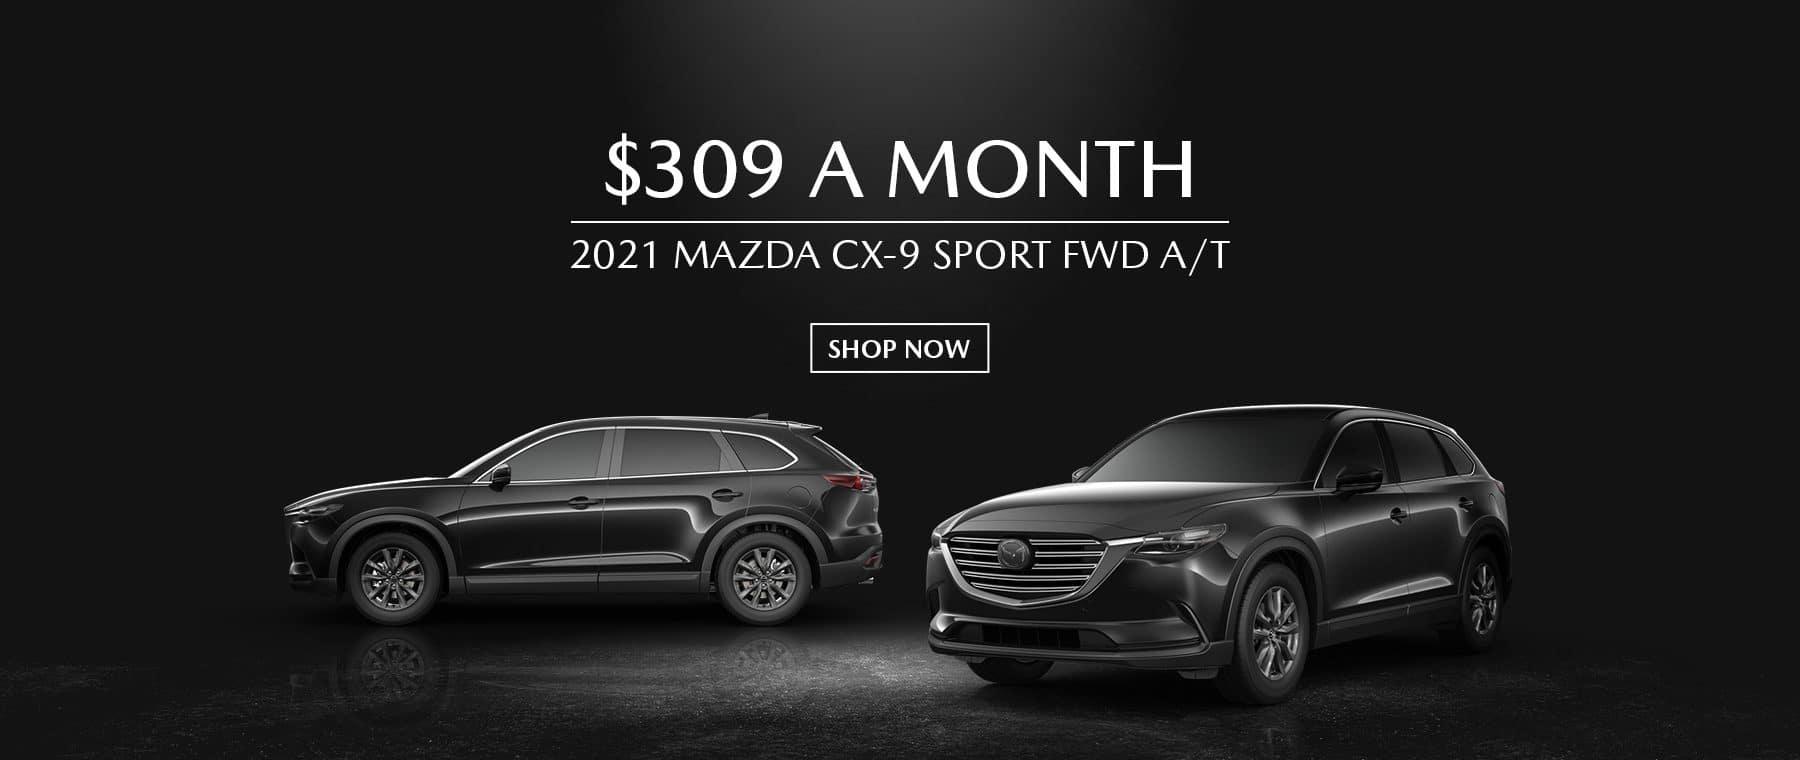 2021 Mazda CX9 Special